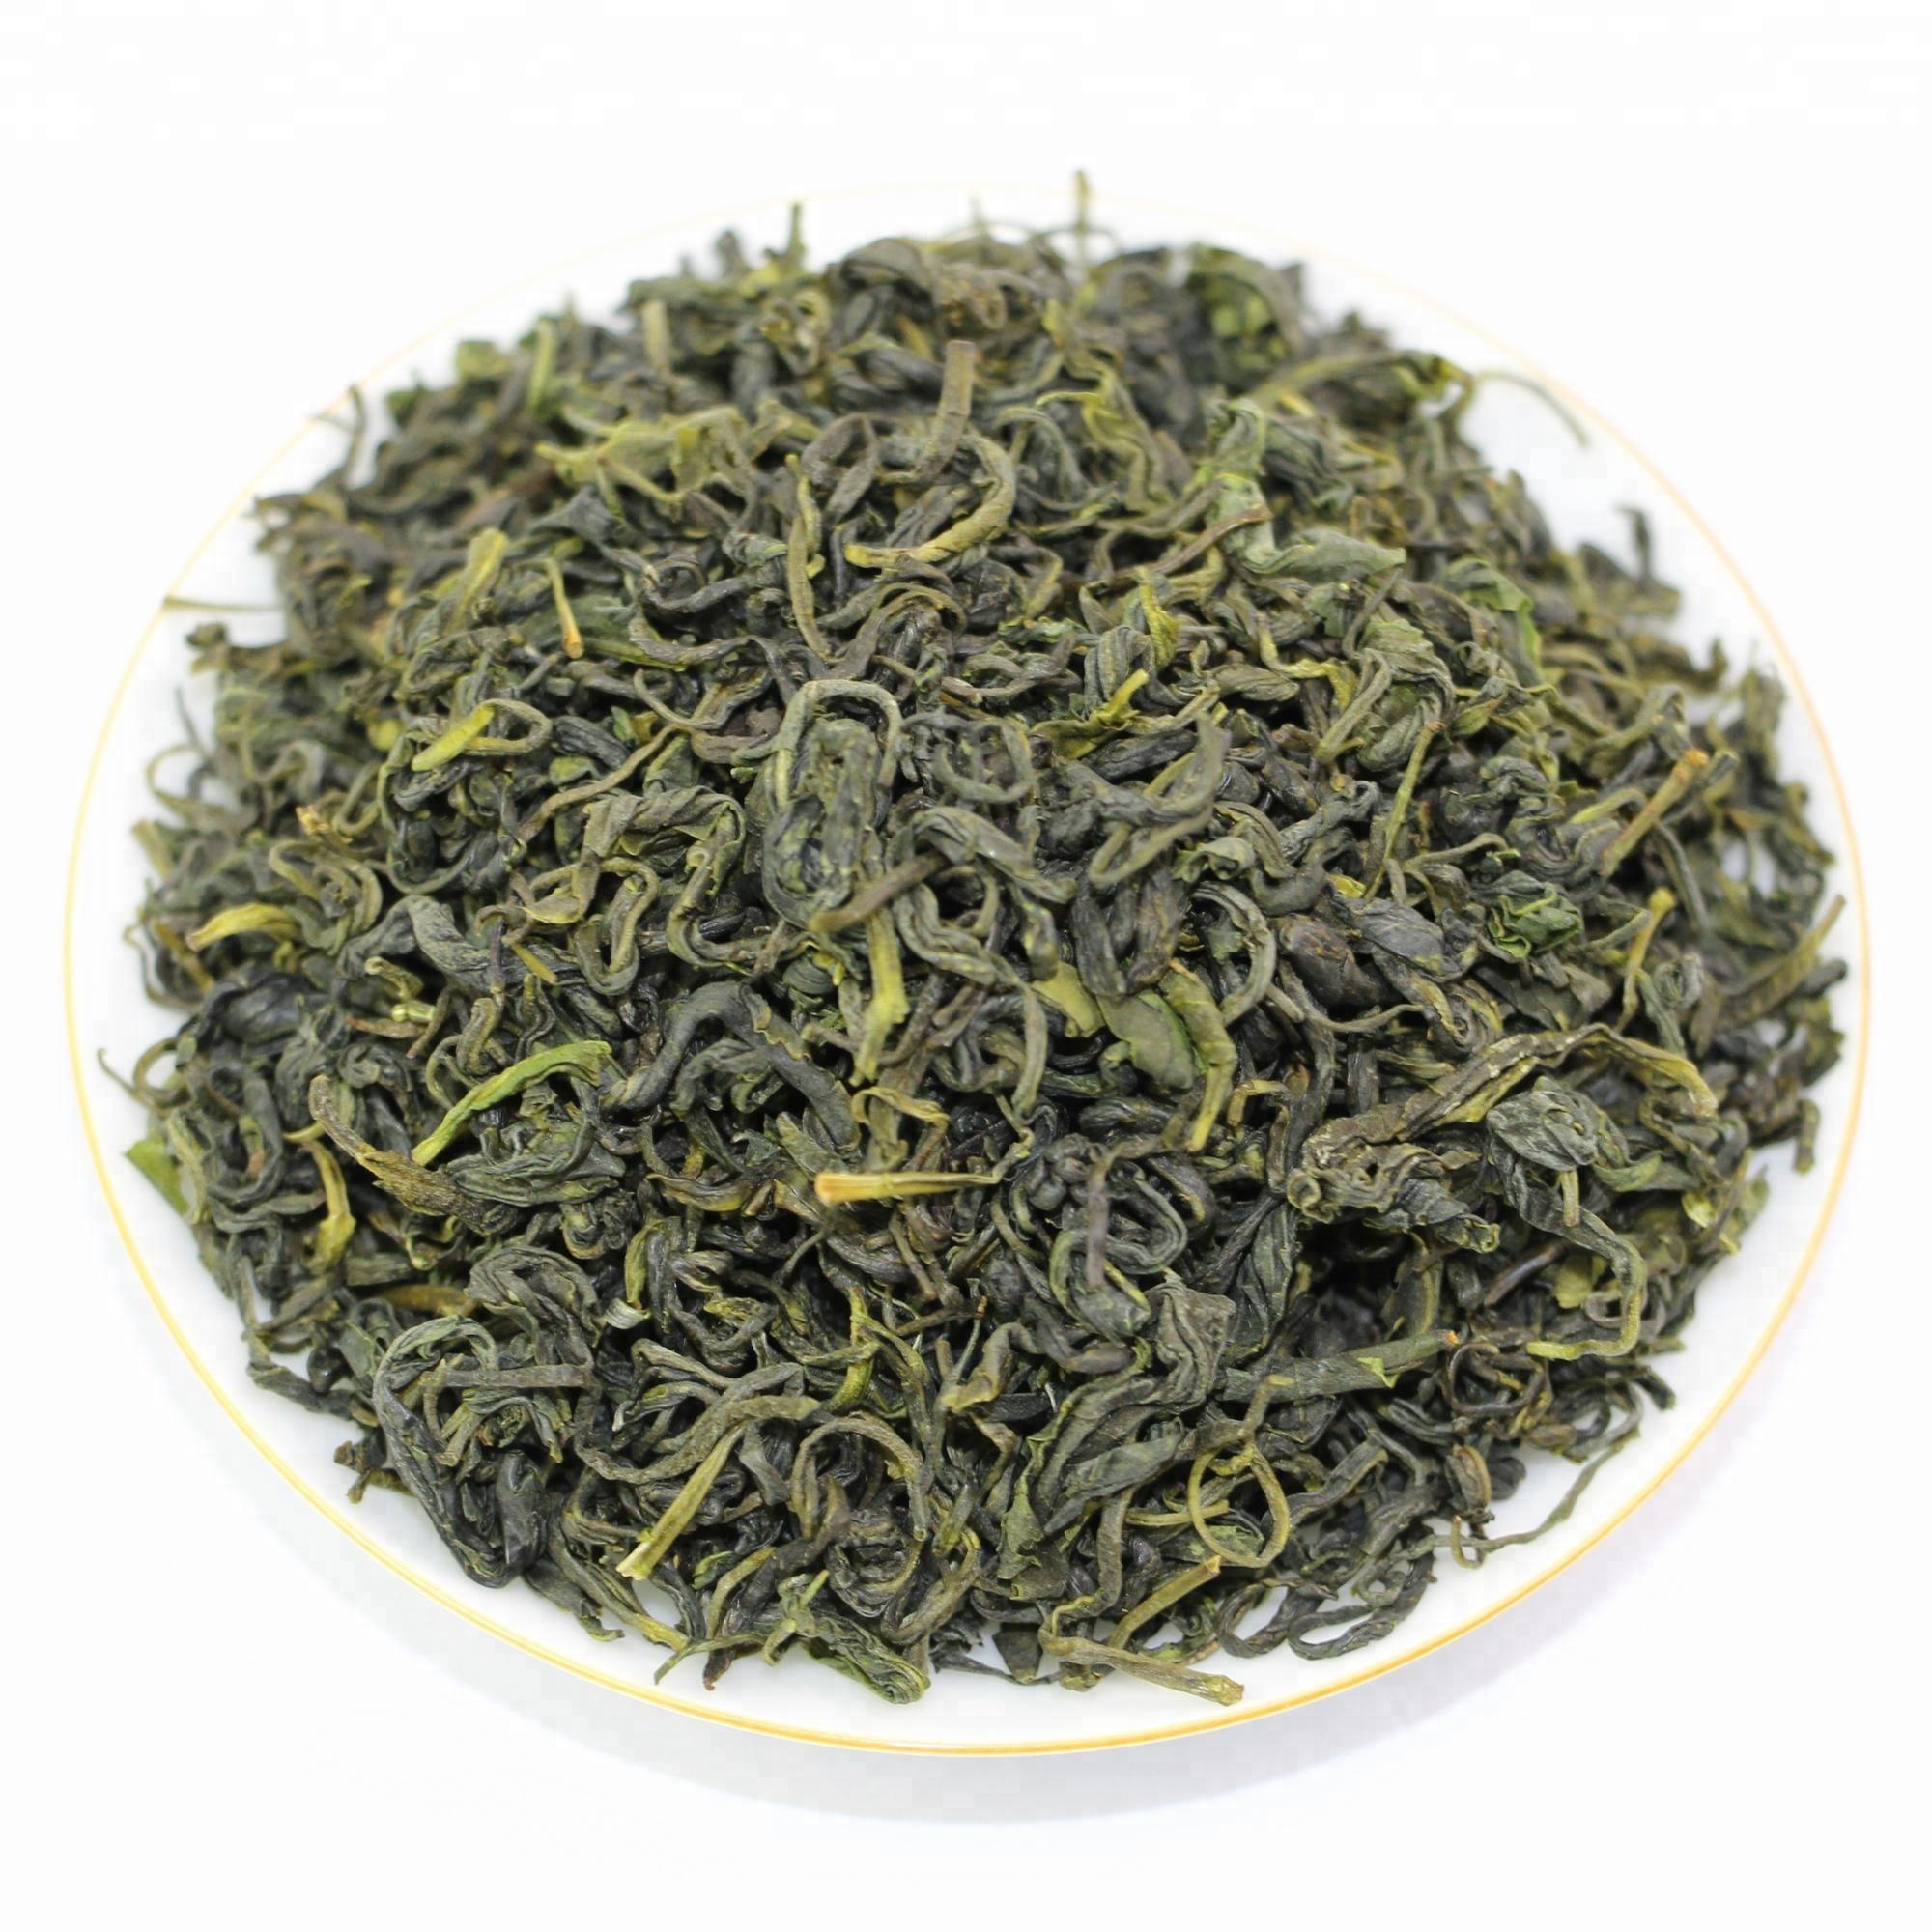 Tea plant information tea shop online benefits of green tea - 4uTea | 4uTea.com